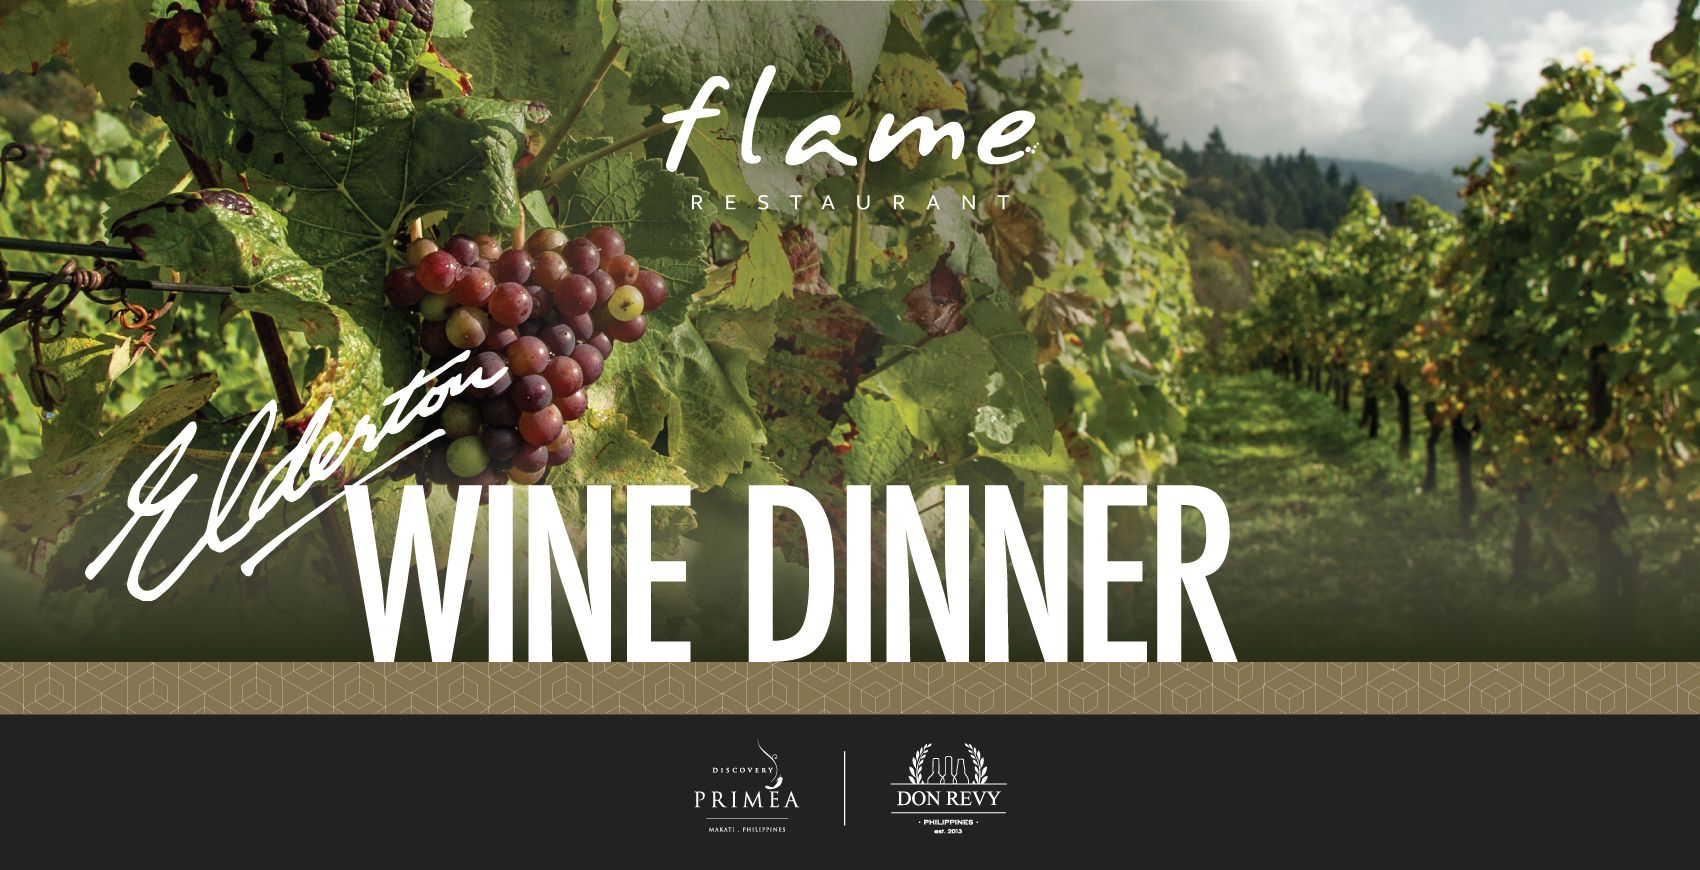 Elderton Wine Dinner at Flame